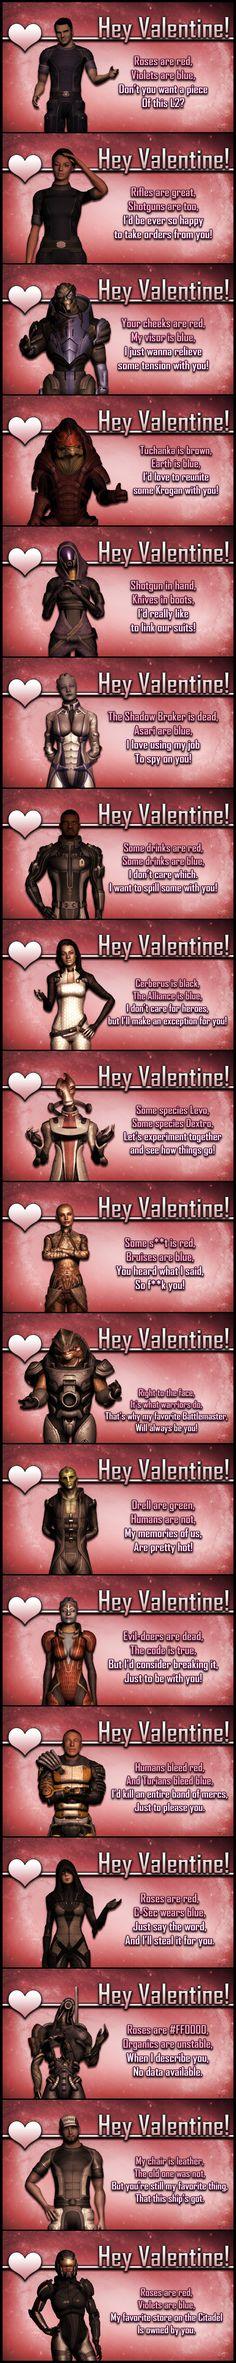 Hey Valentine by: Lordess-Alicia on deviantART